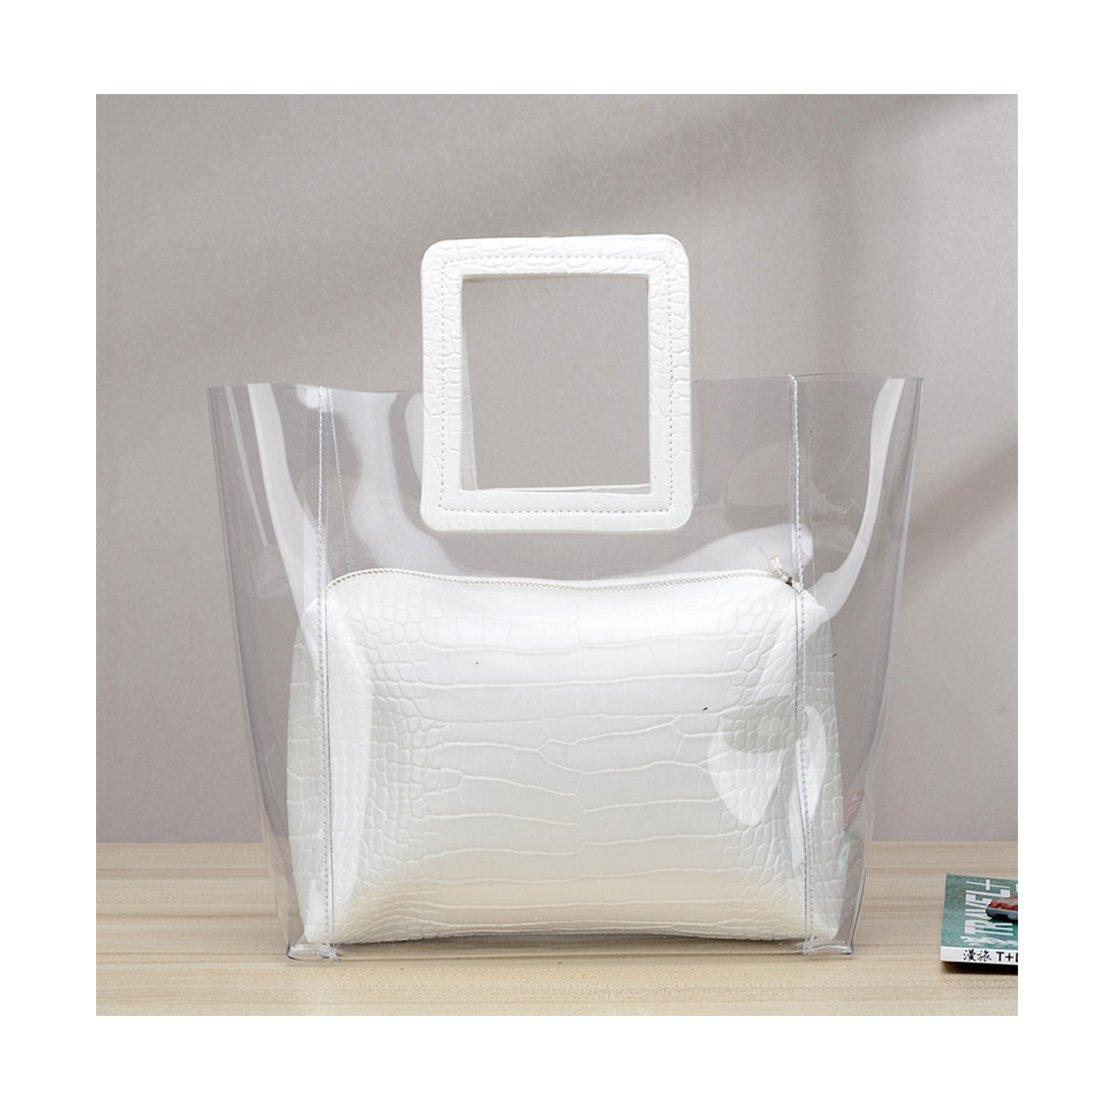 FANCY LOVE Classy Waterprof Clear Tote Beach Shoulder Crossbody Bag (White) by Barabum (Image #2)